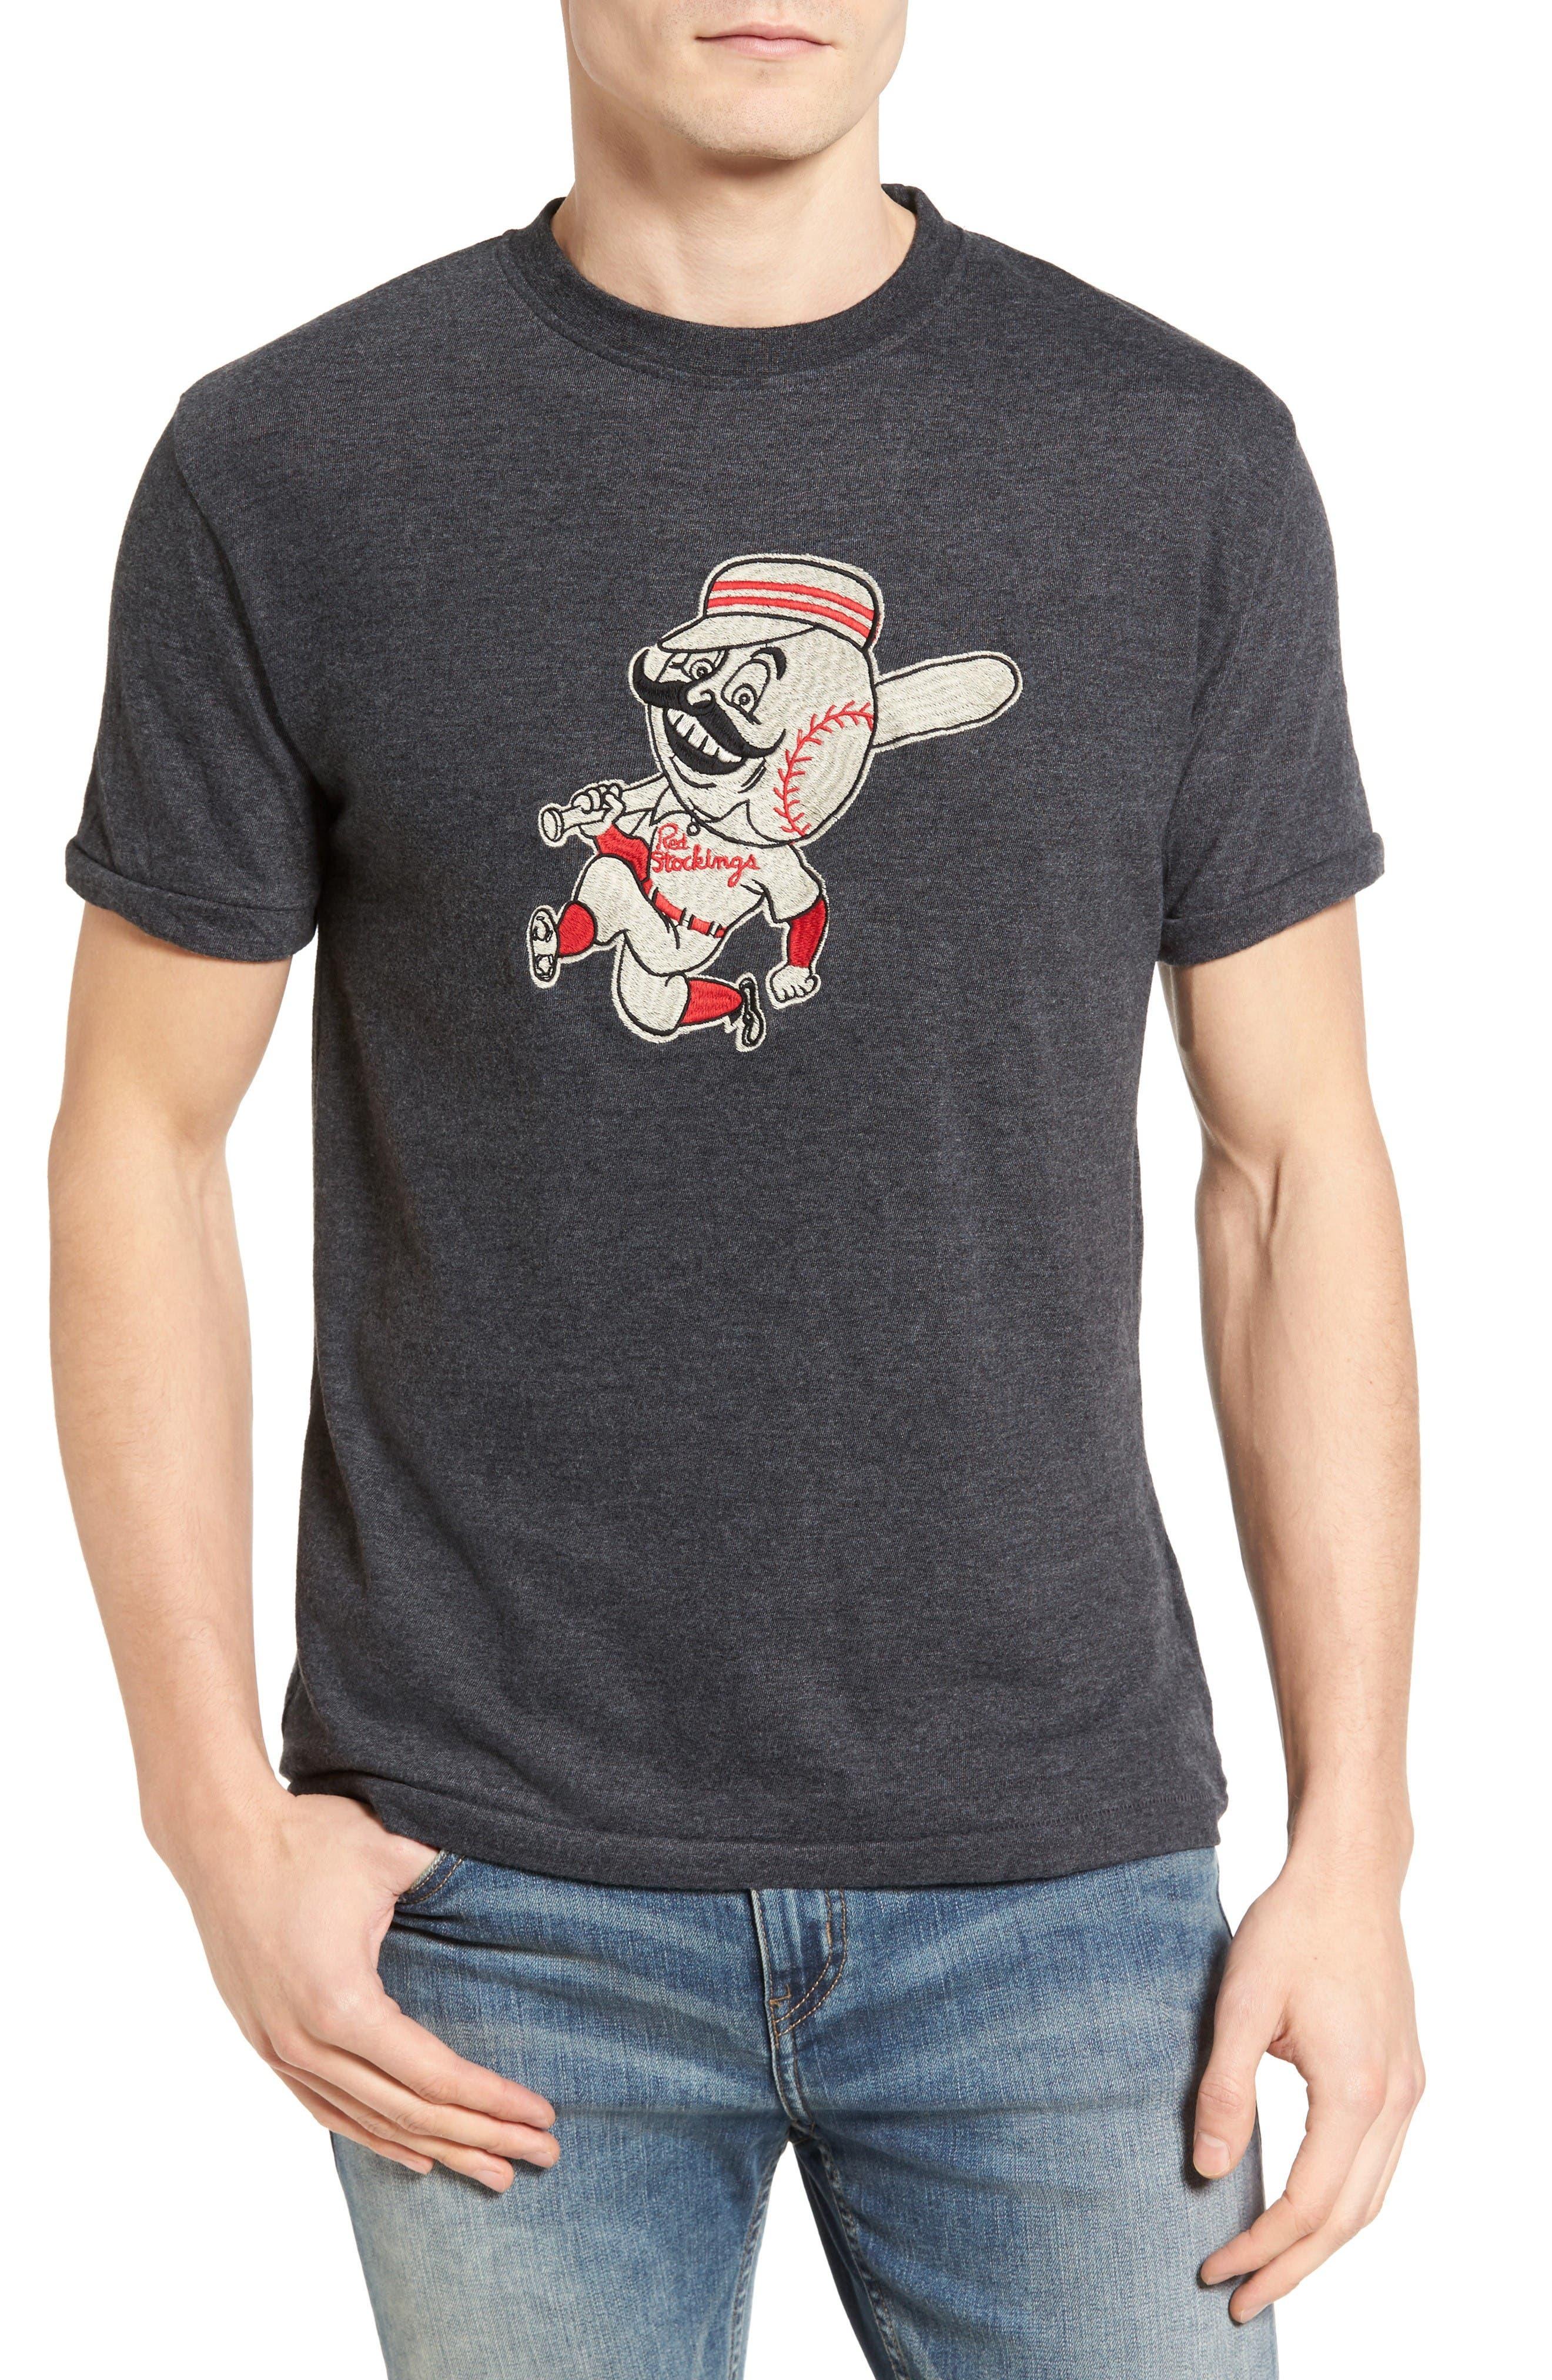 Alternate Image 1 Selected - American Needle Hillwood Cincinnati Reds T-Shirt